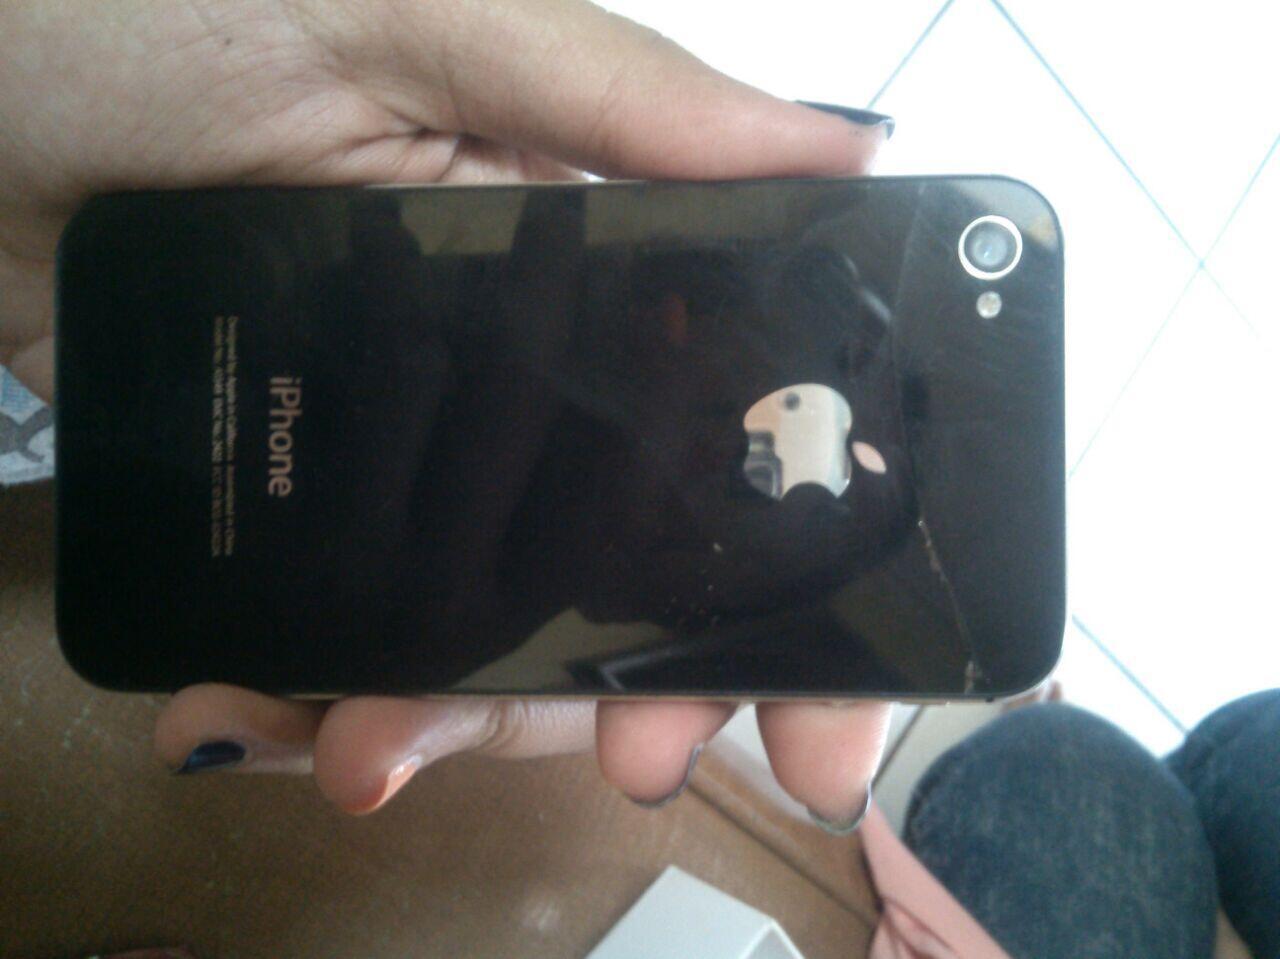 Iphone 4 CDMA 16Gb 2nd Bandung 1,4jt fullset